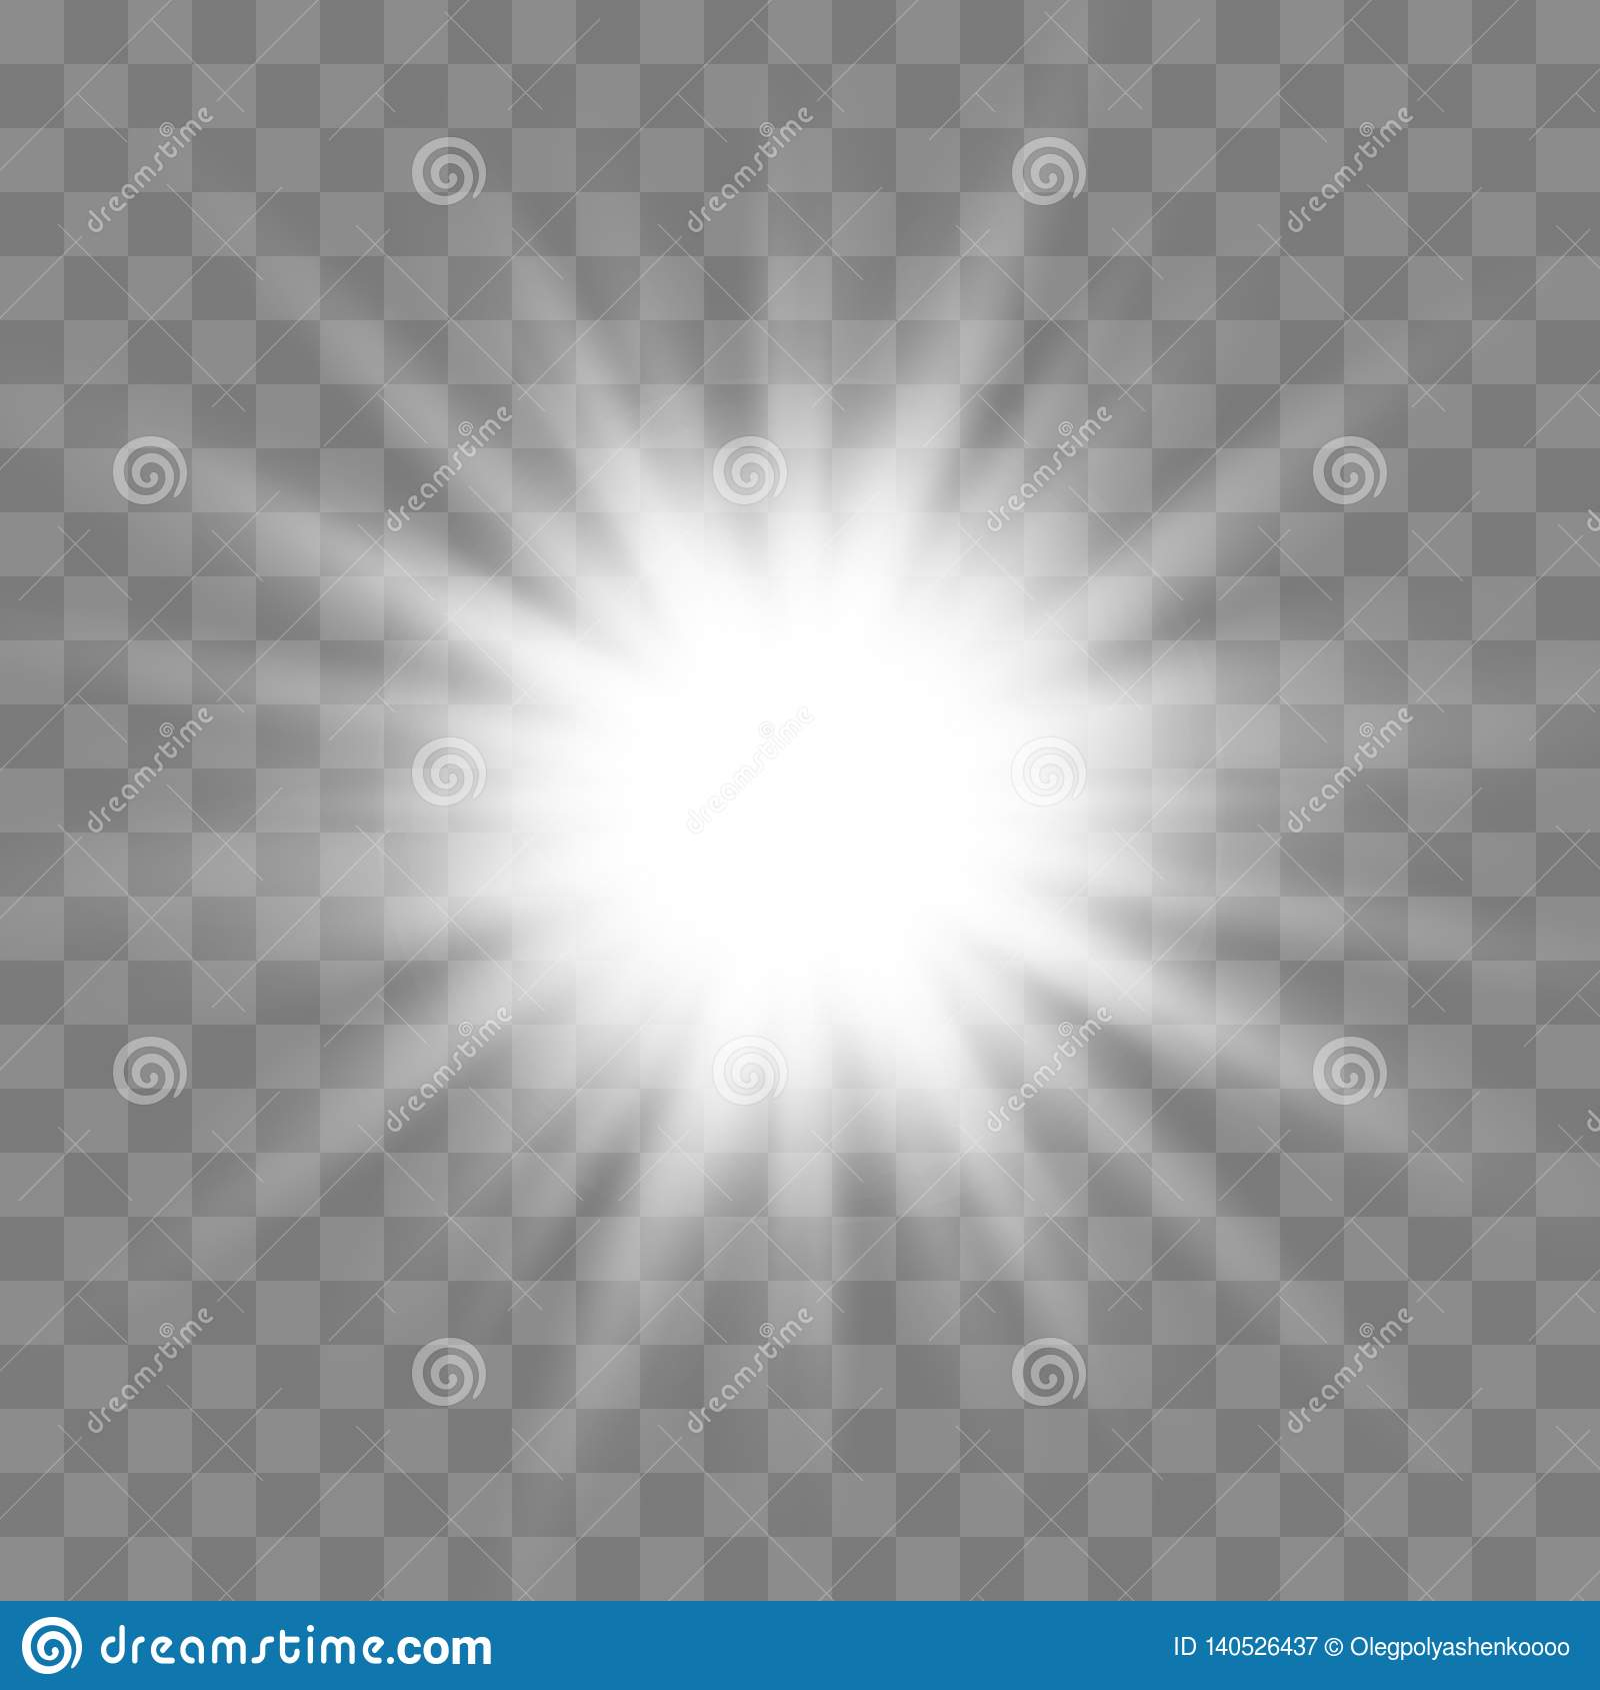 Glow light burst explosion